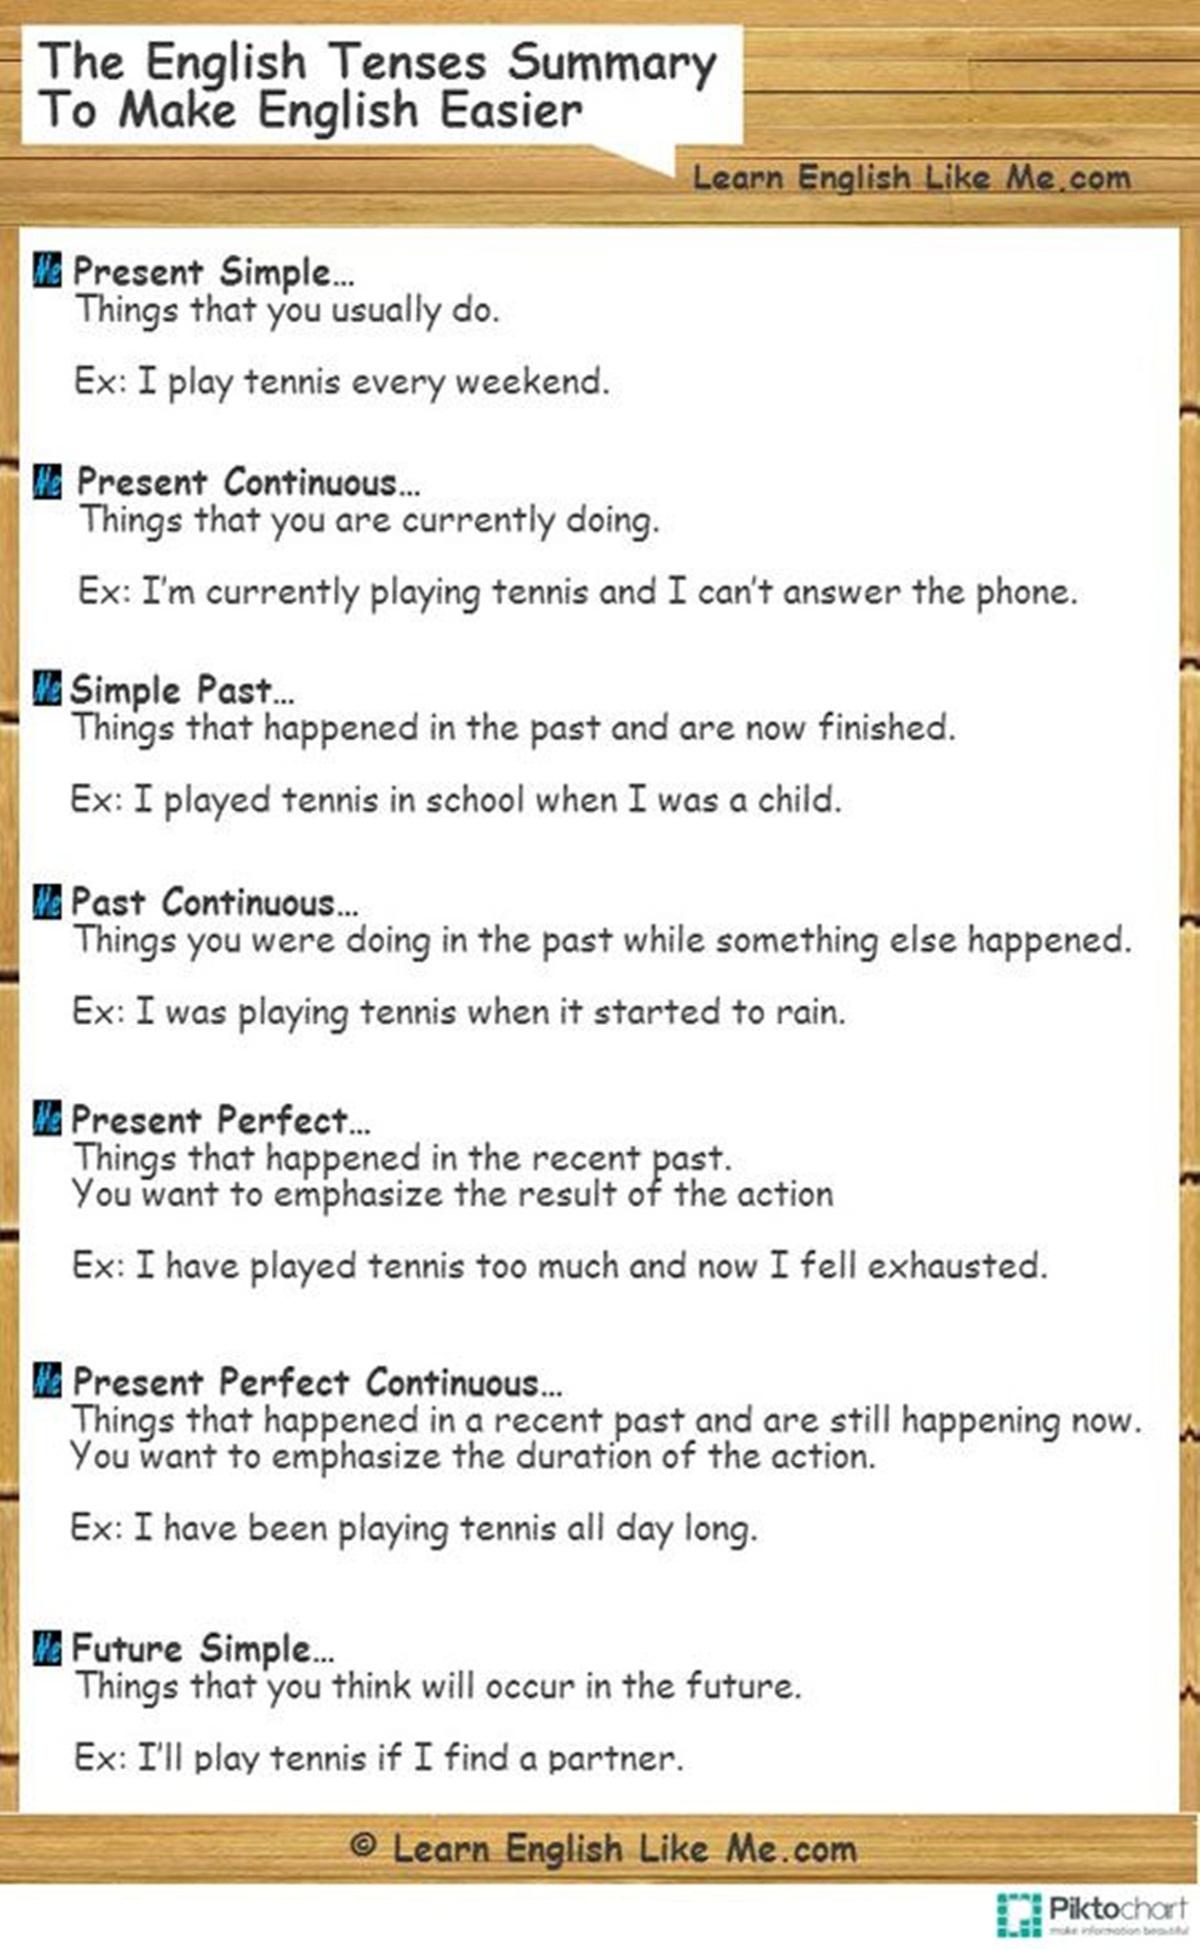 The English Tenses Summary to Make English Easier 3